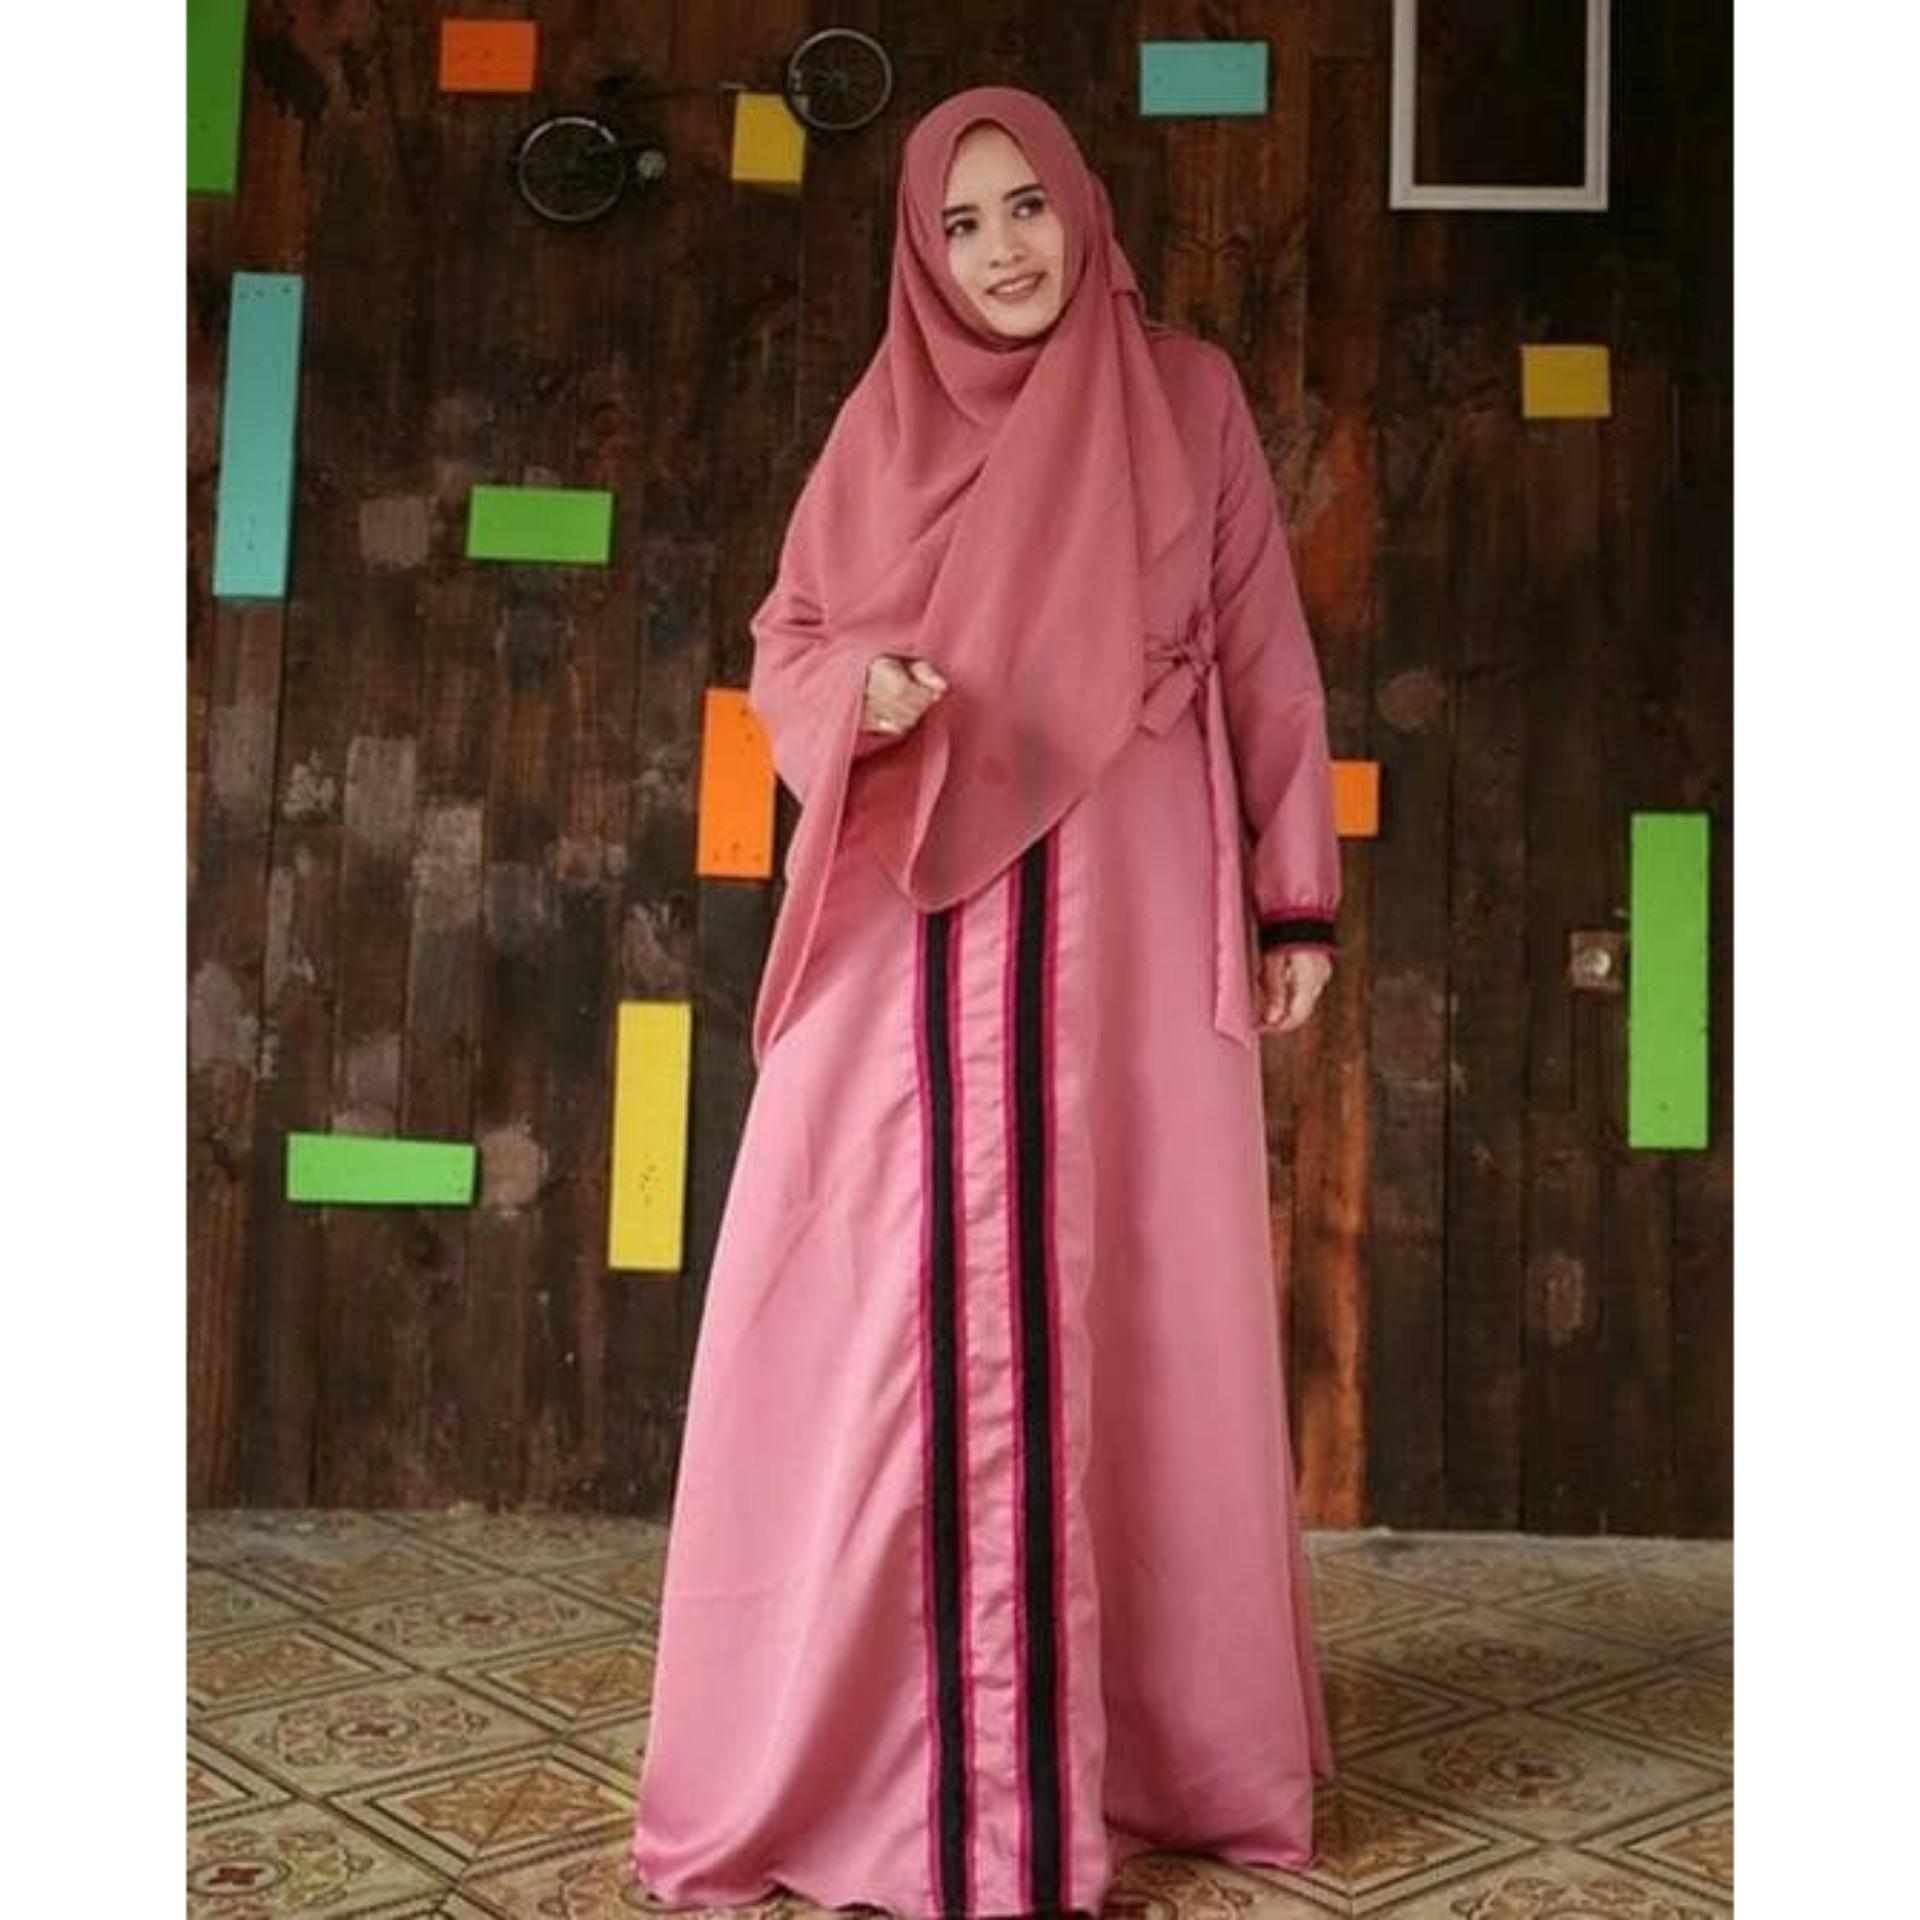 ... Muslim Baju Modern Cantik Trendy Terkini Murah. Source · Uc Kebaya Modern Atika Gamis Kutu Baru Modern Hijab Syari Syari ... - Baju